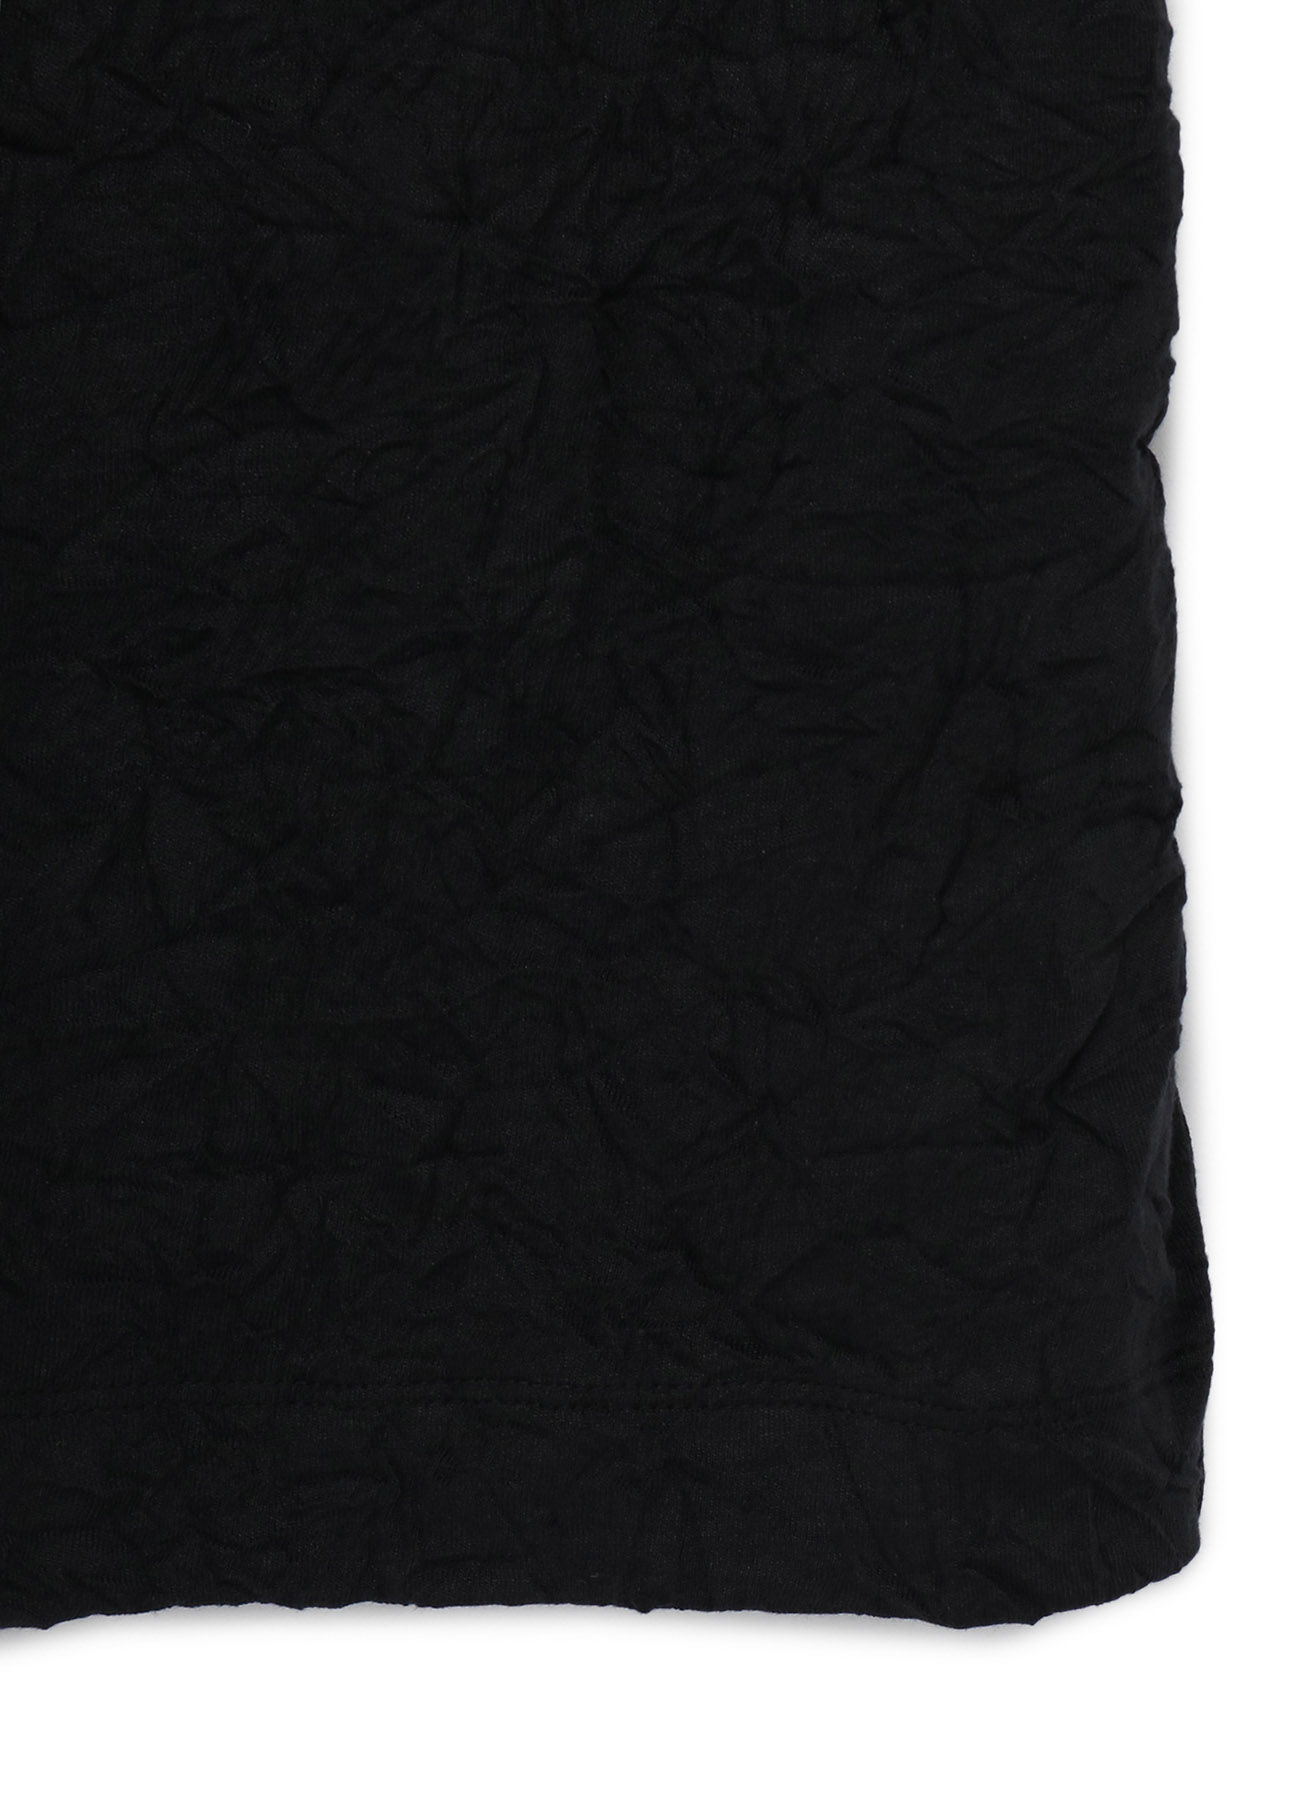 C/Pe Washer Jersey Jumbo Sleeves Opened Cut Sew